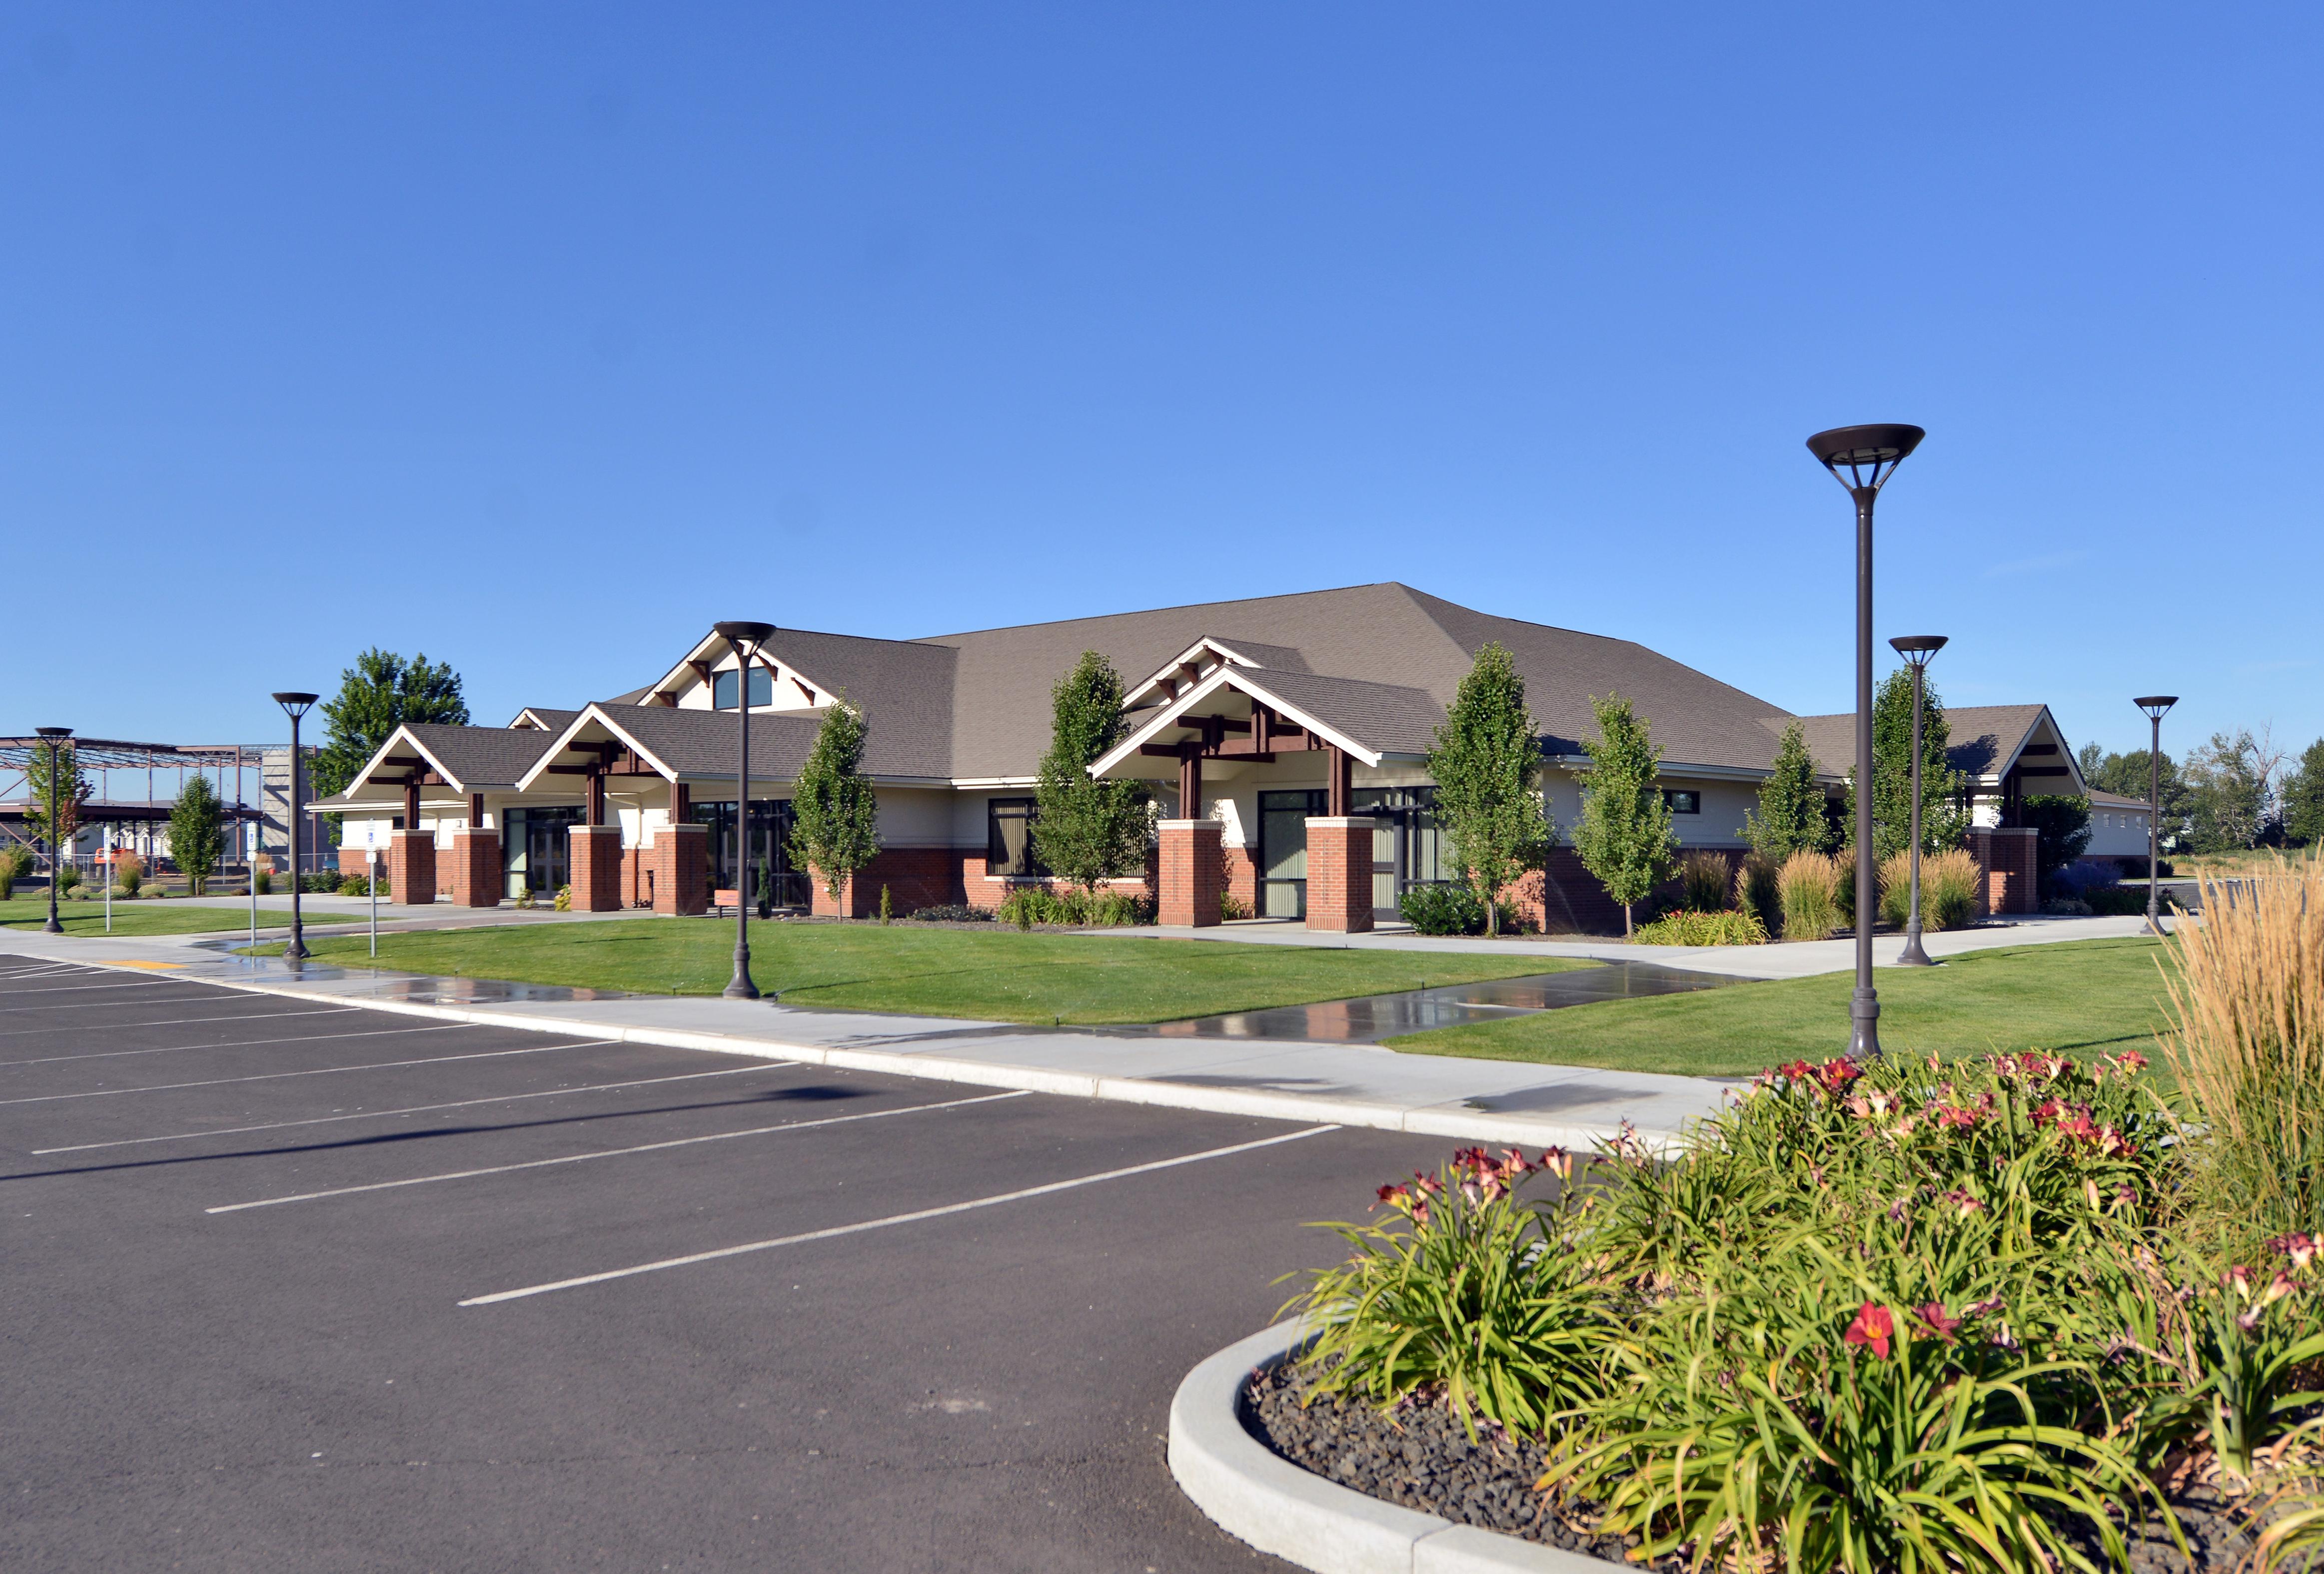 Caldwell Center at PNW University